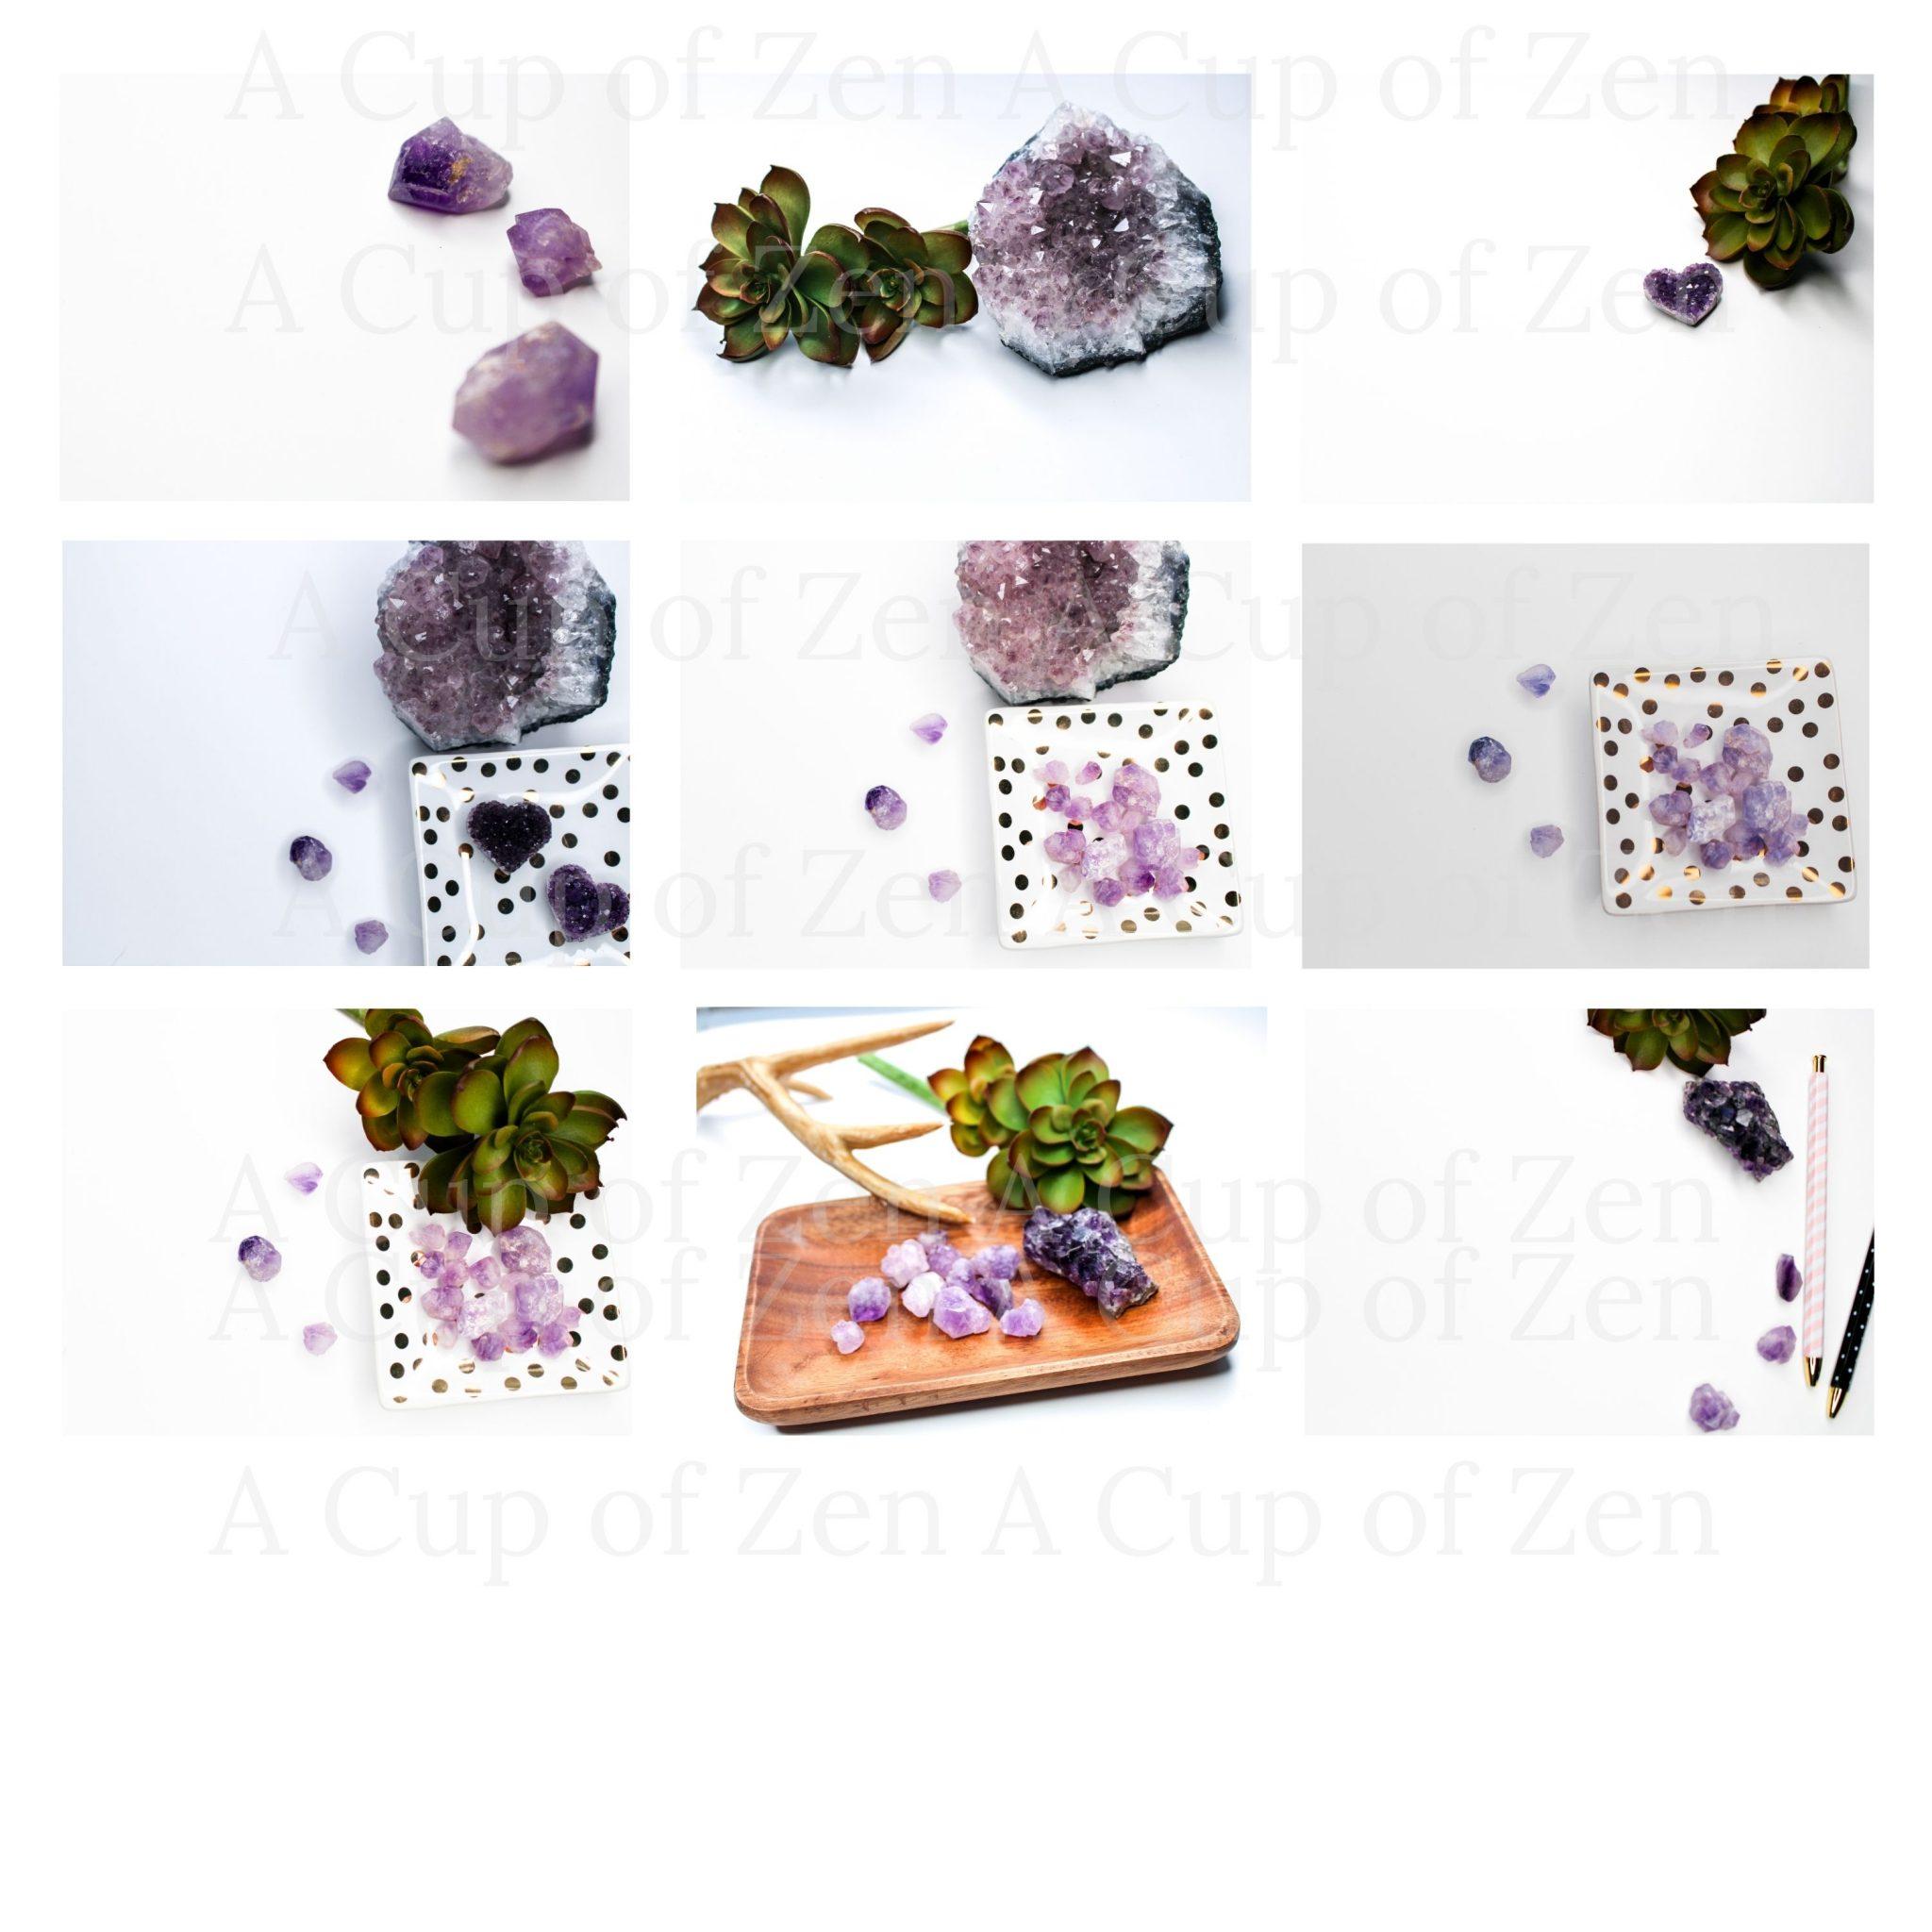 amethyst crystals royalty free photos